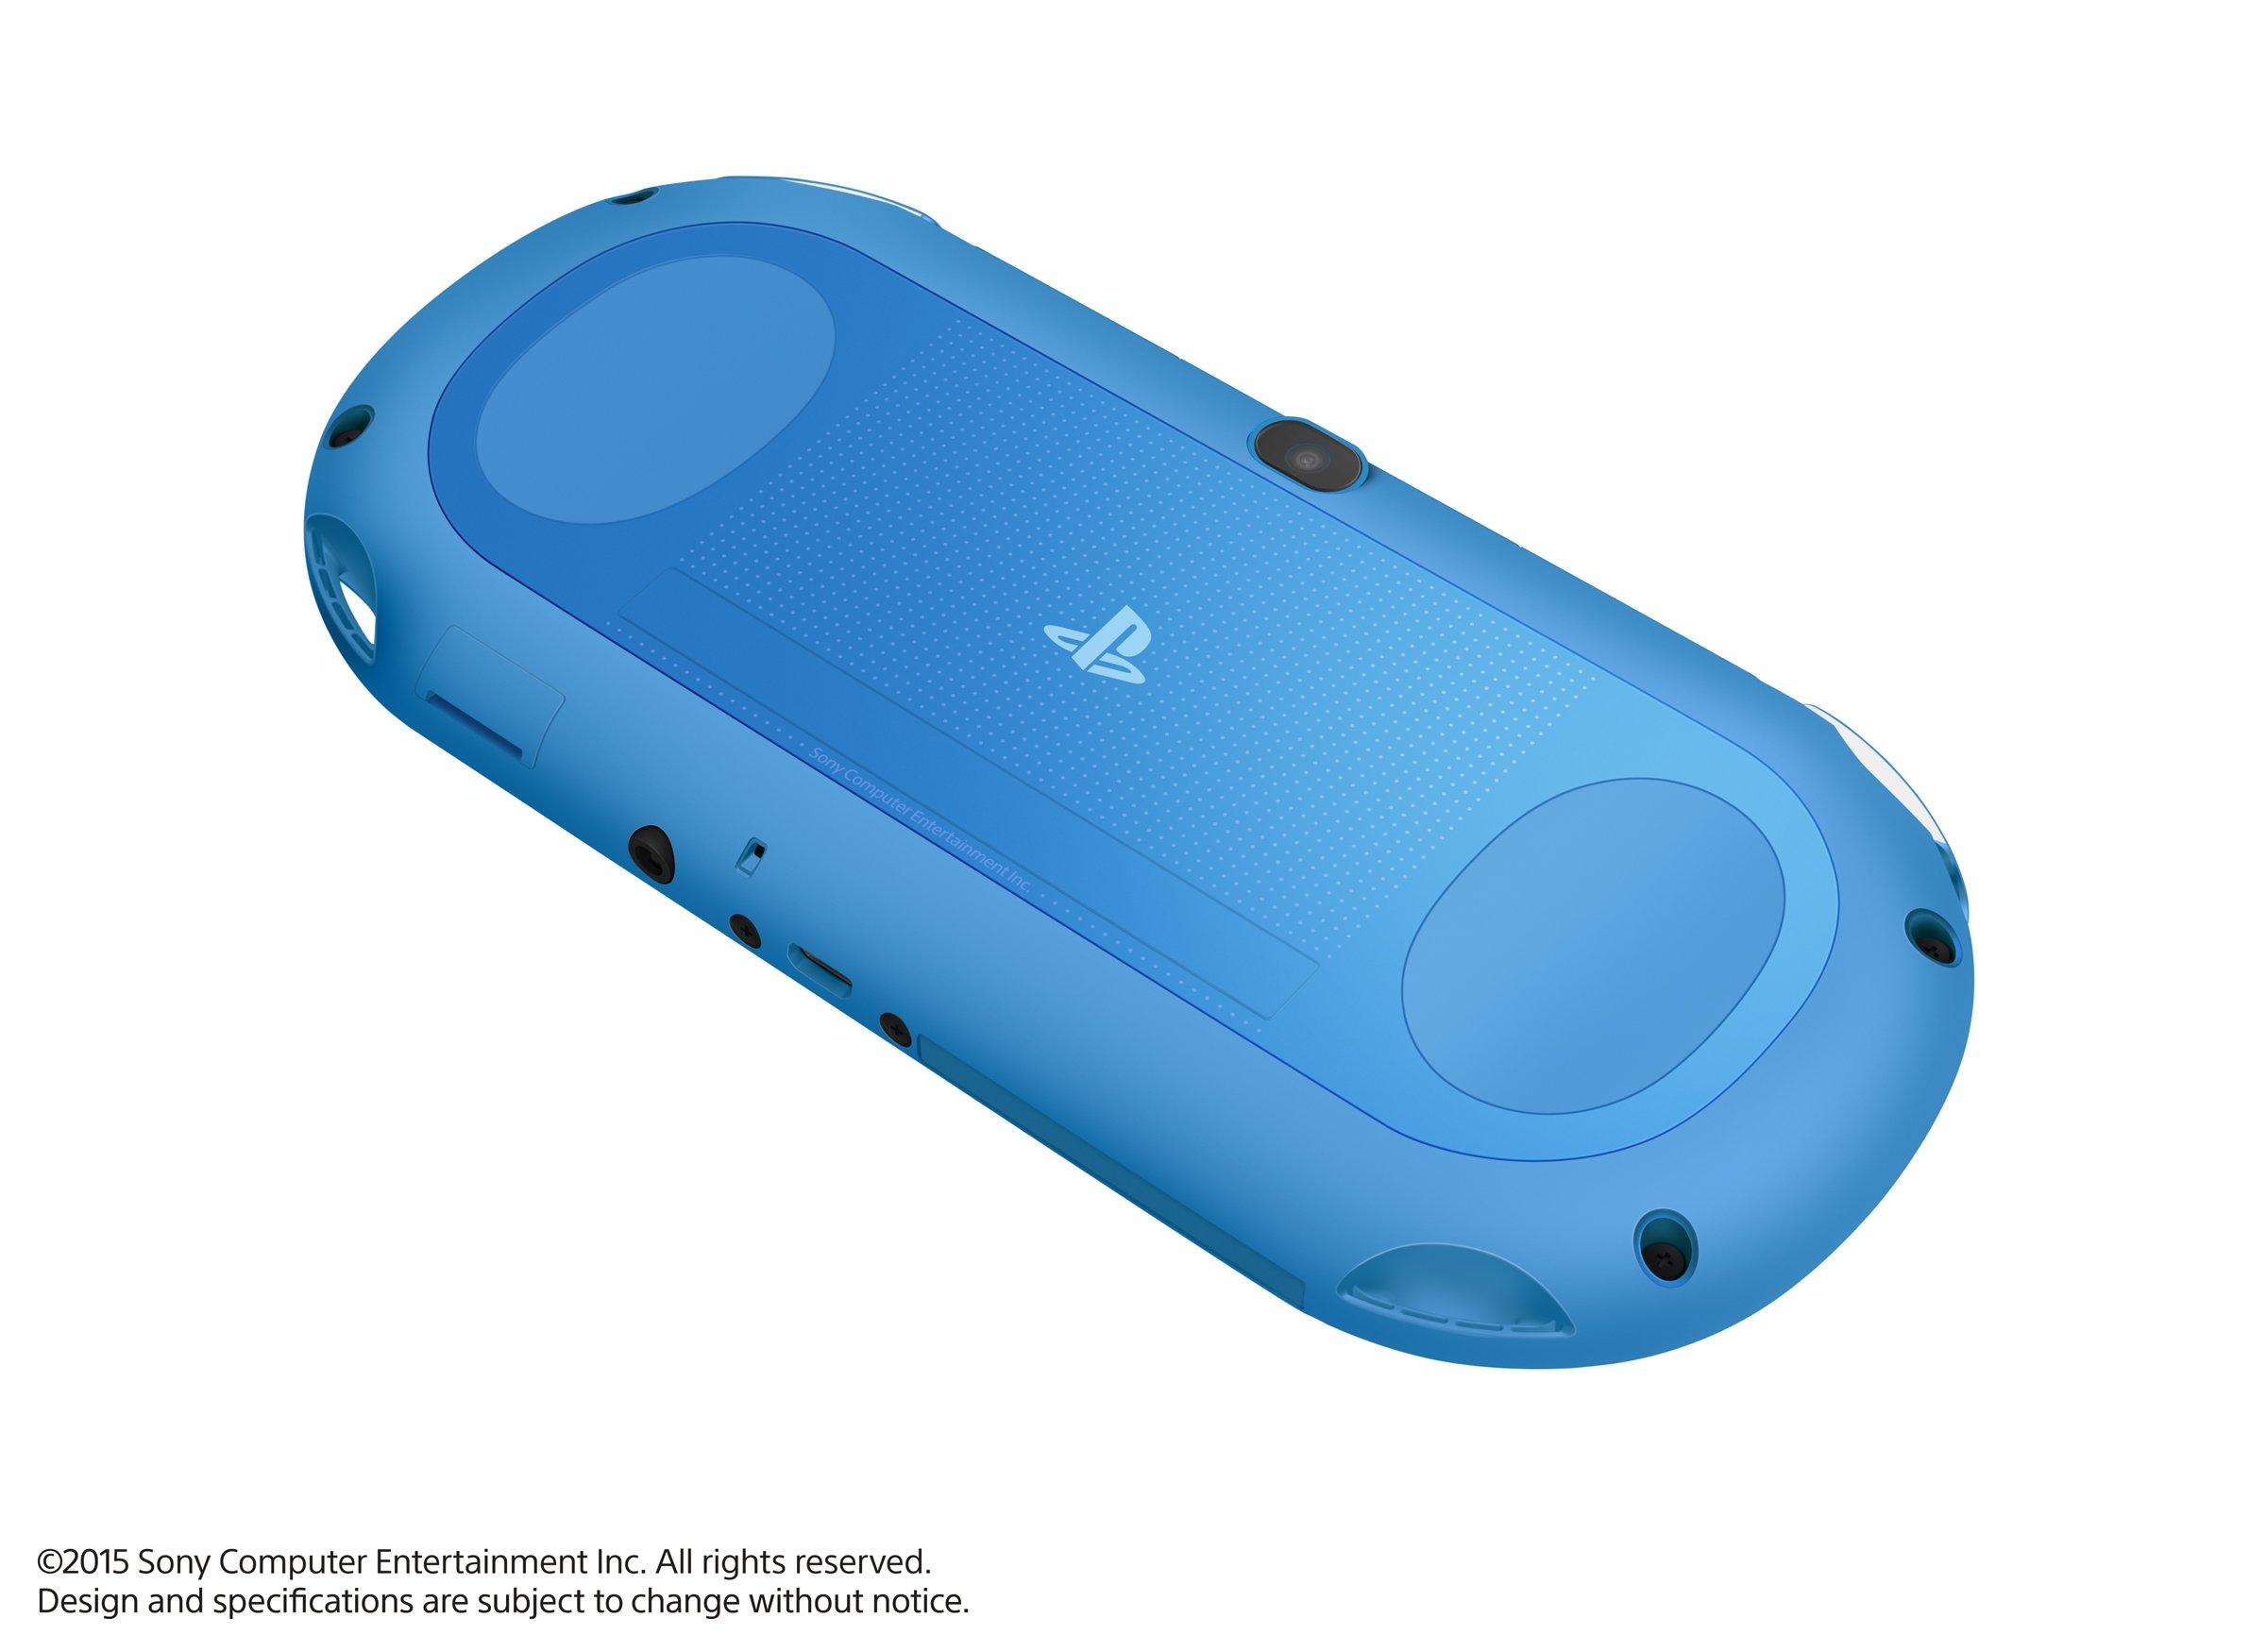 PlayStation Vita Wi-Fi model Aqua Blue (PCH-2000ZA23) Japanese Ver. Japan Import by Sony (Image #5)